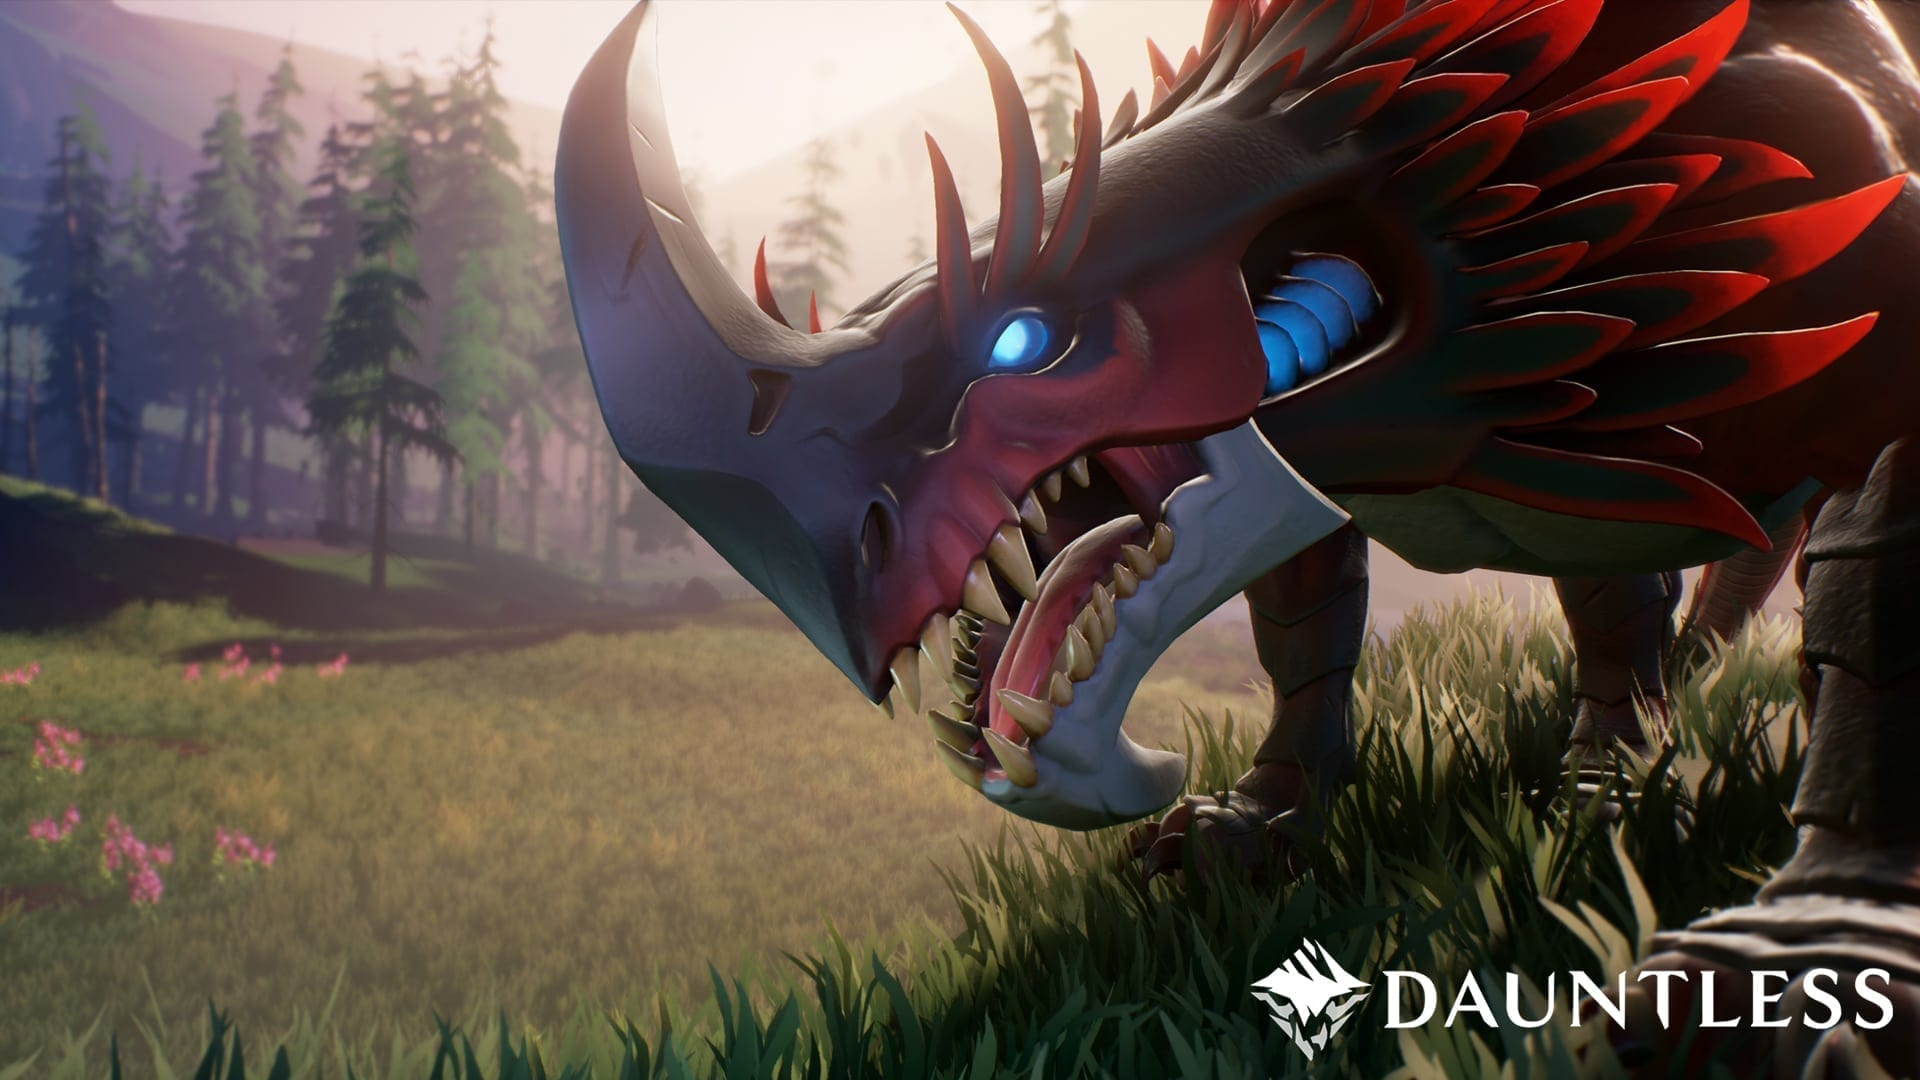 dauntless-game-screenshot-4